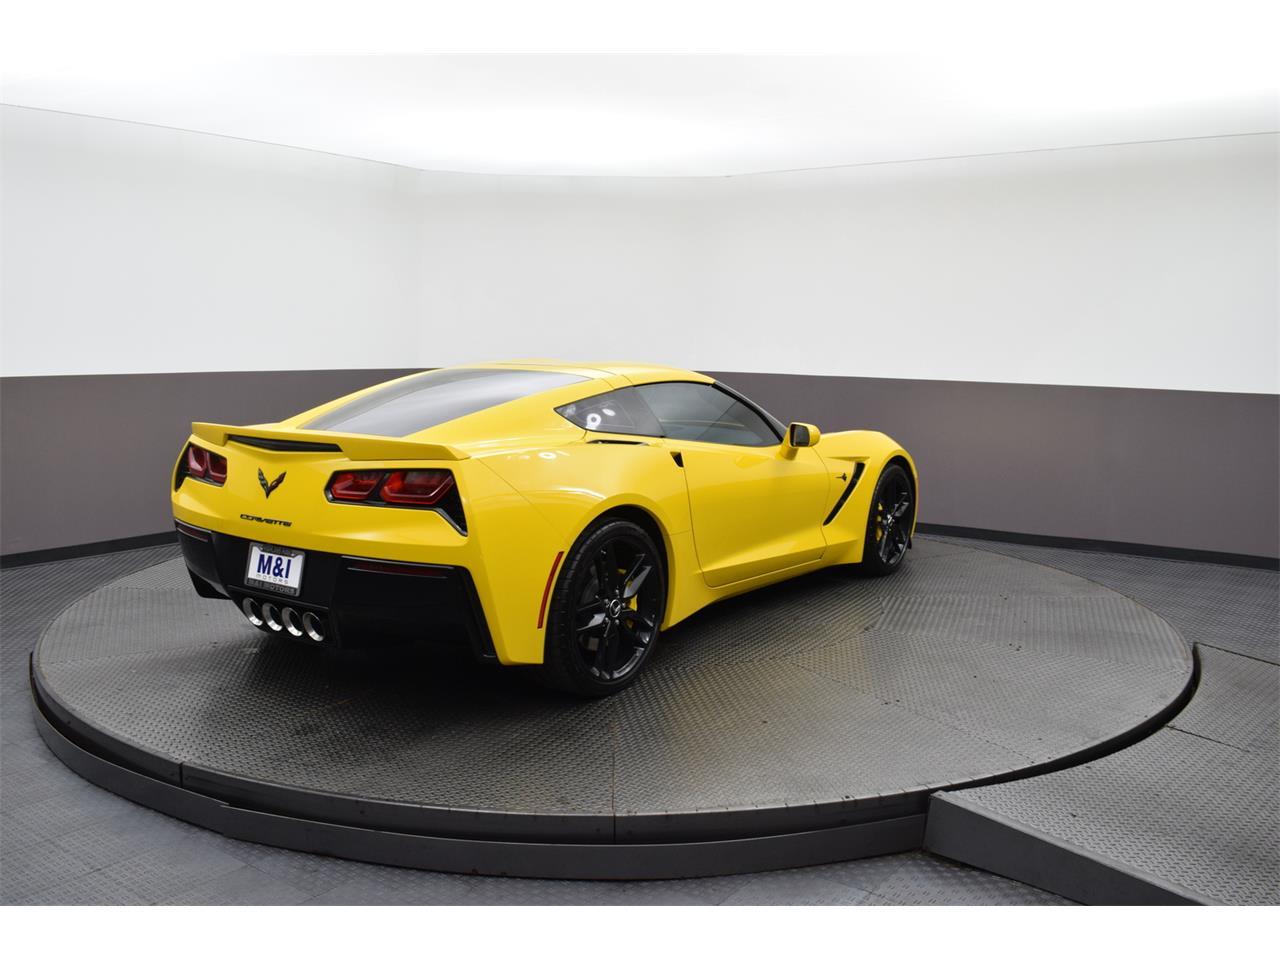 2015 Chevrolet Corvette Stingray (CC-1410033) for sale in HIGHLAND PARK, Illinois